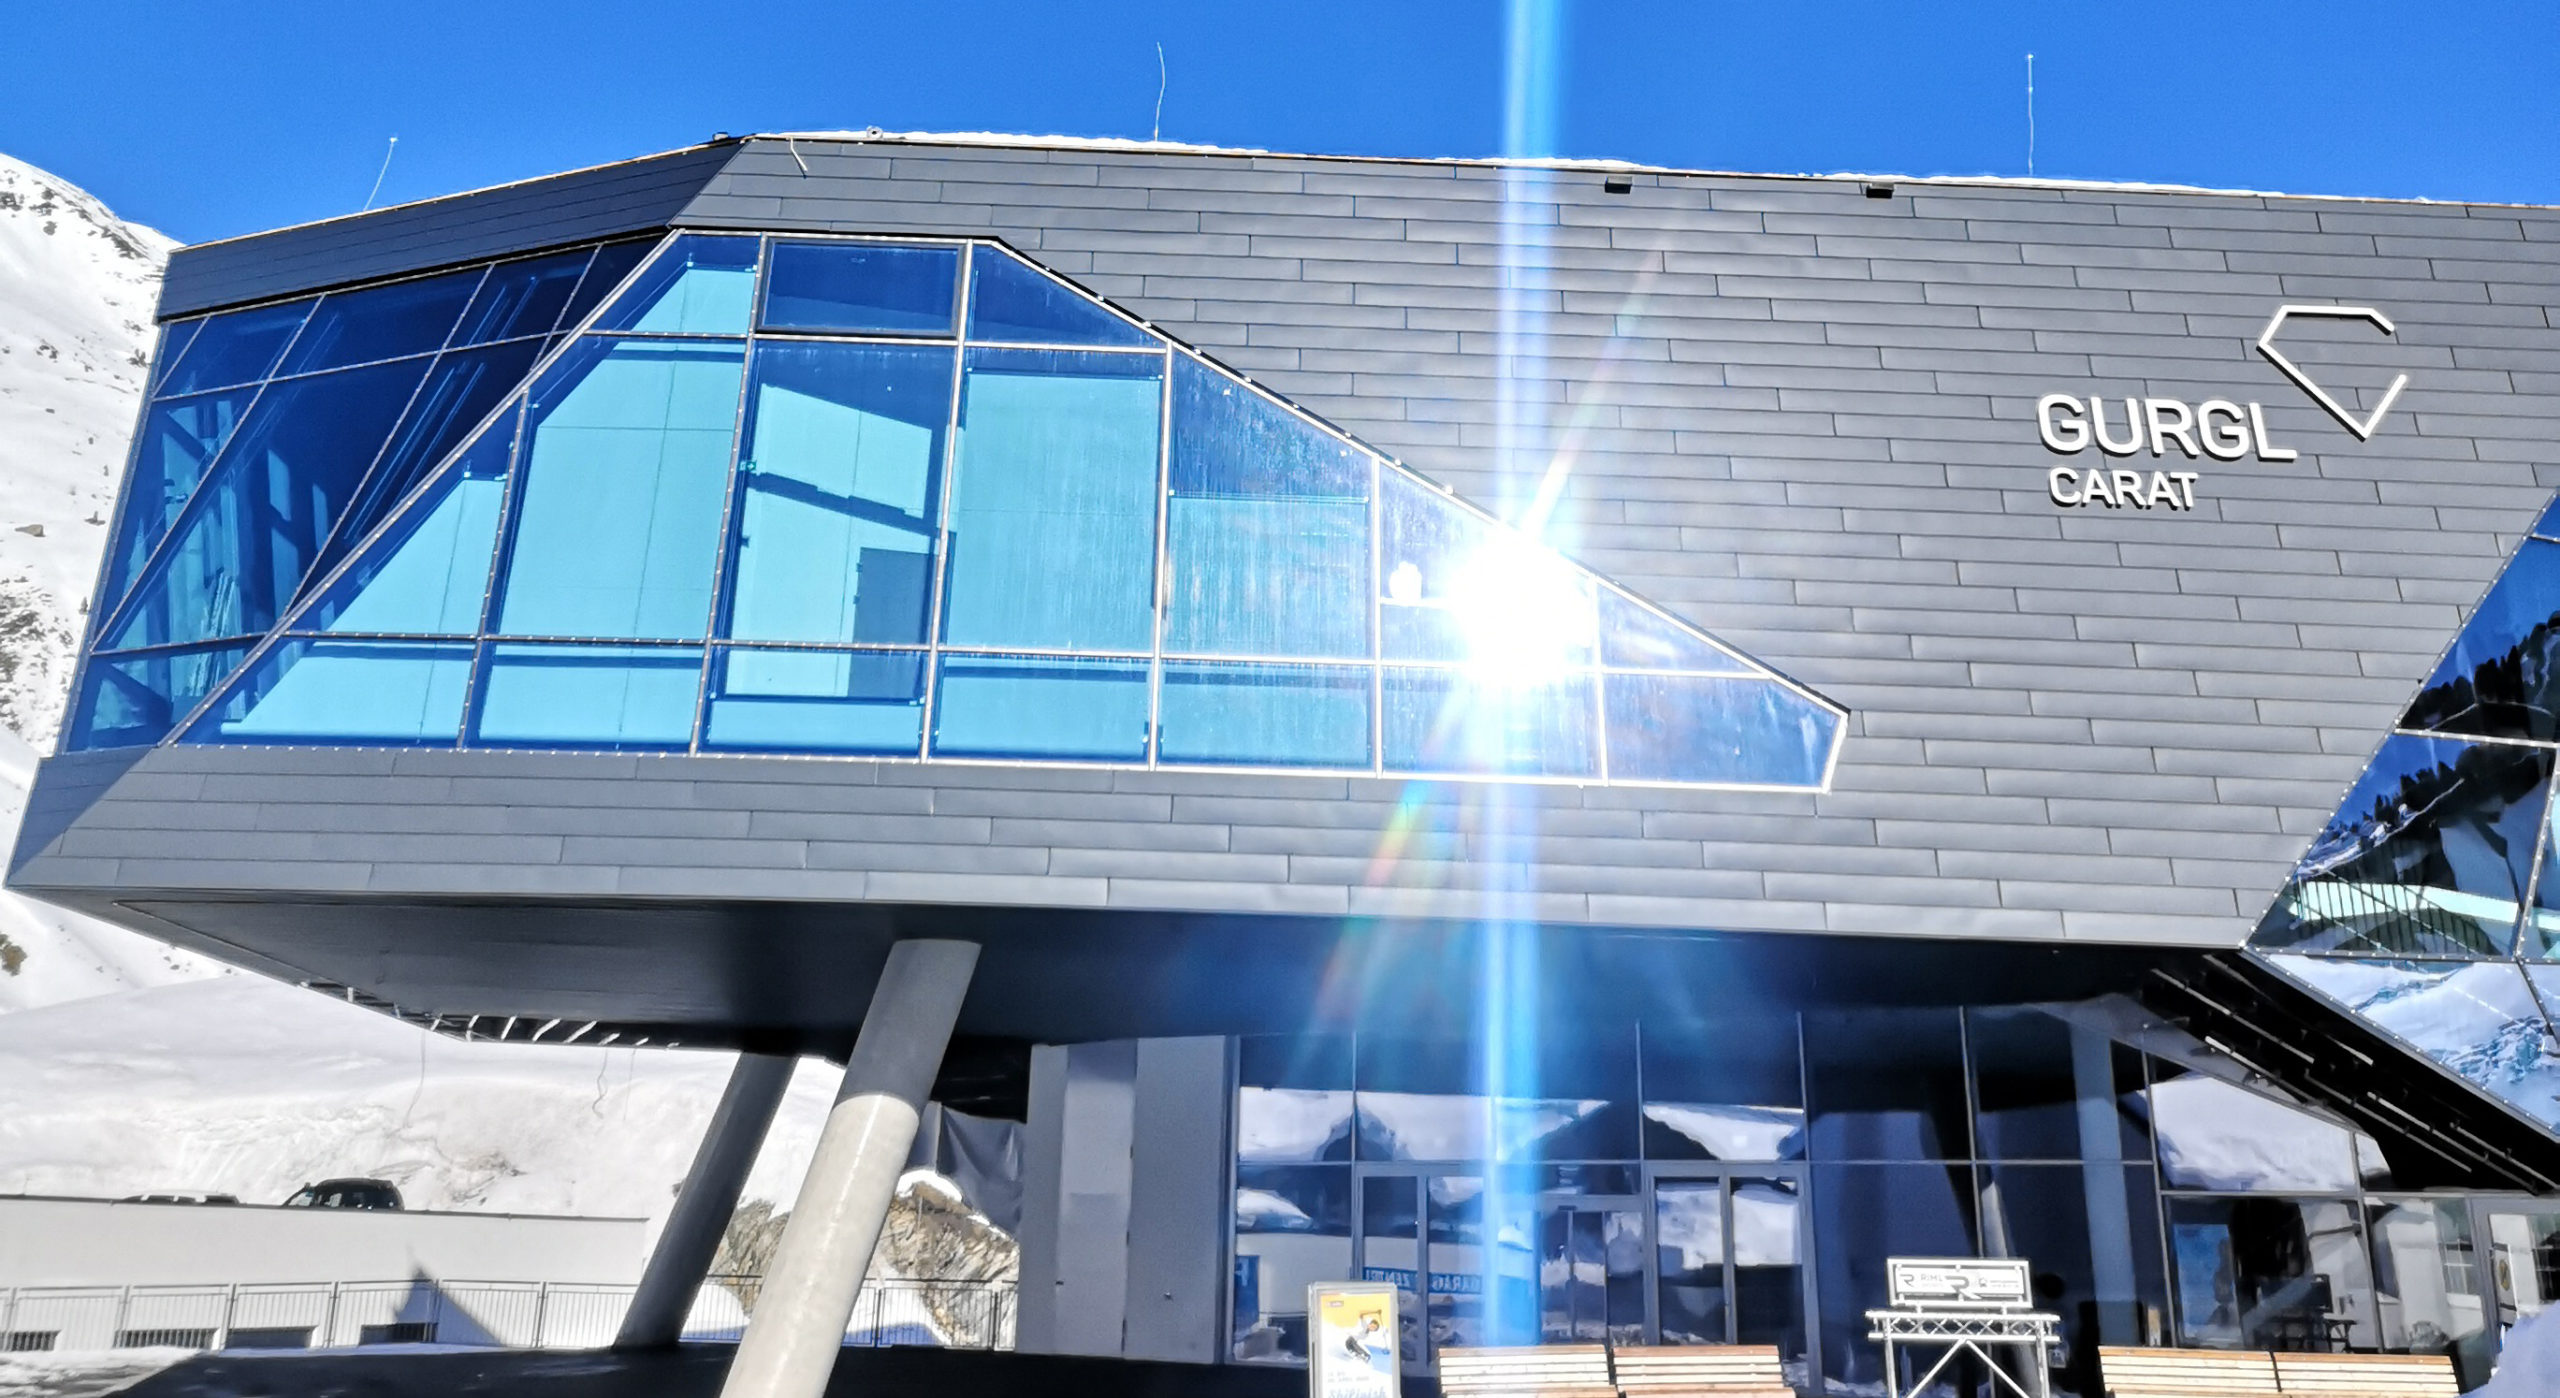 Gurgl Carat Centre Exterior